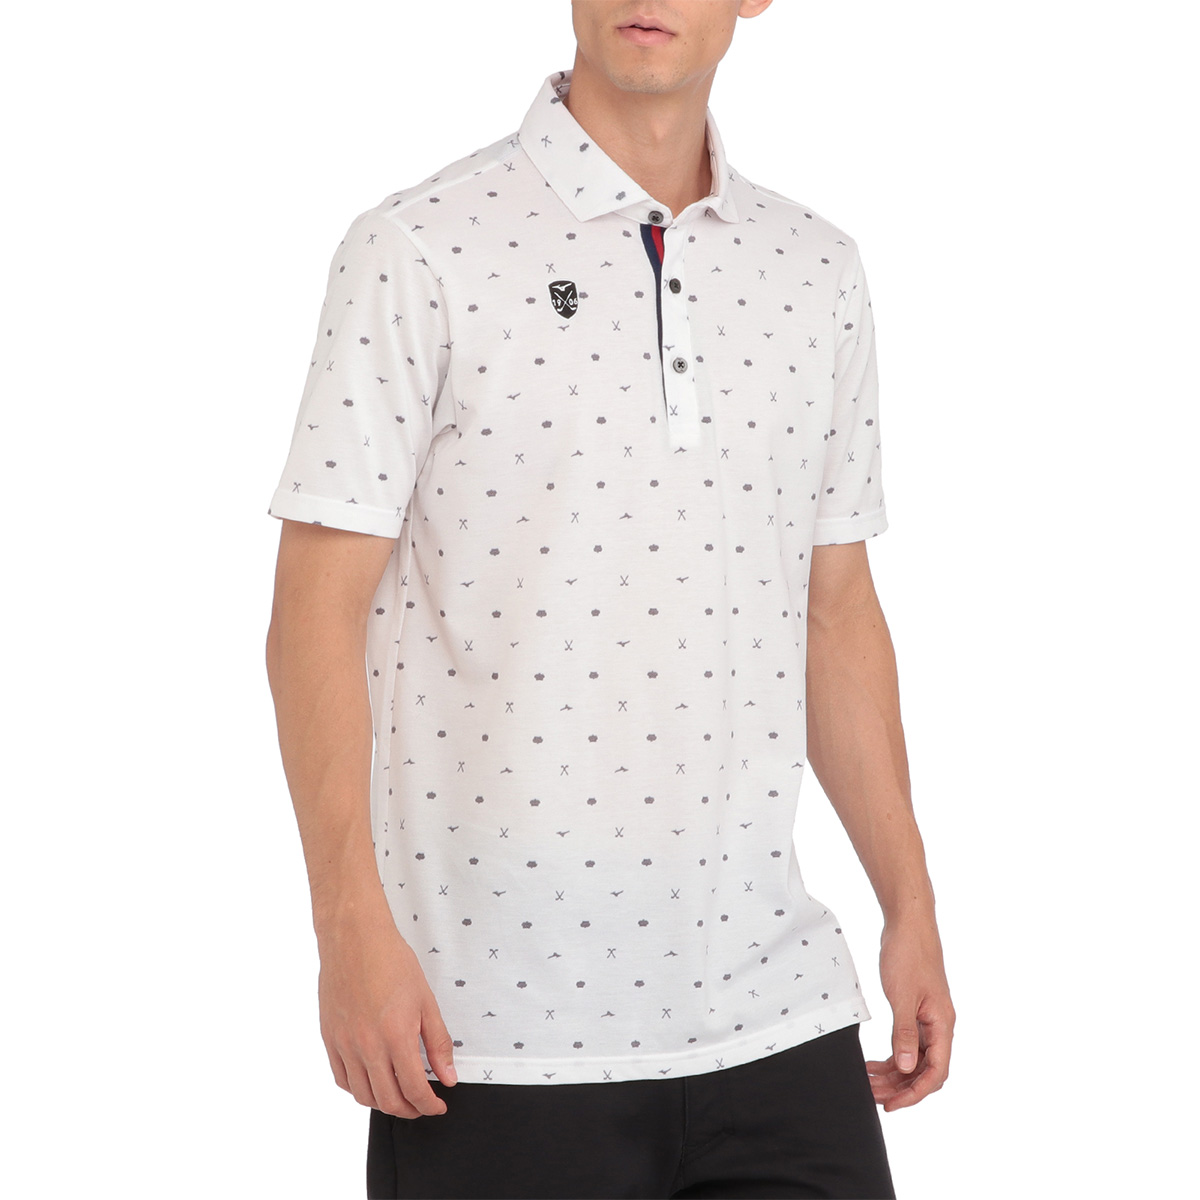 GOLF プリント半袖ポロシャツ